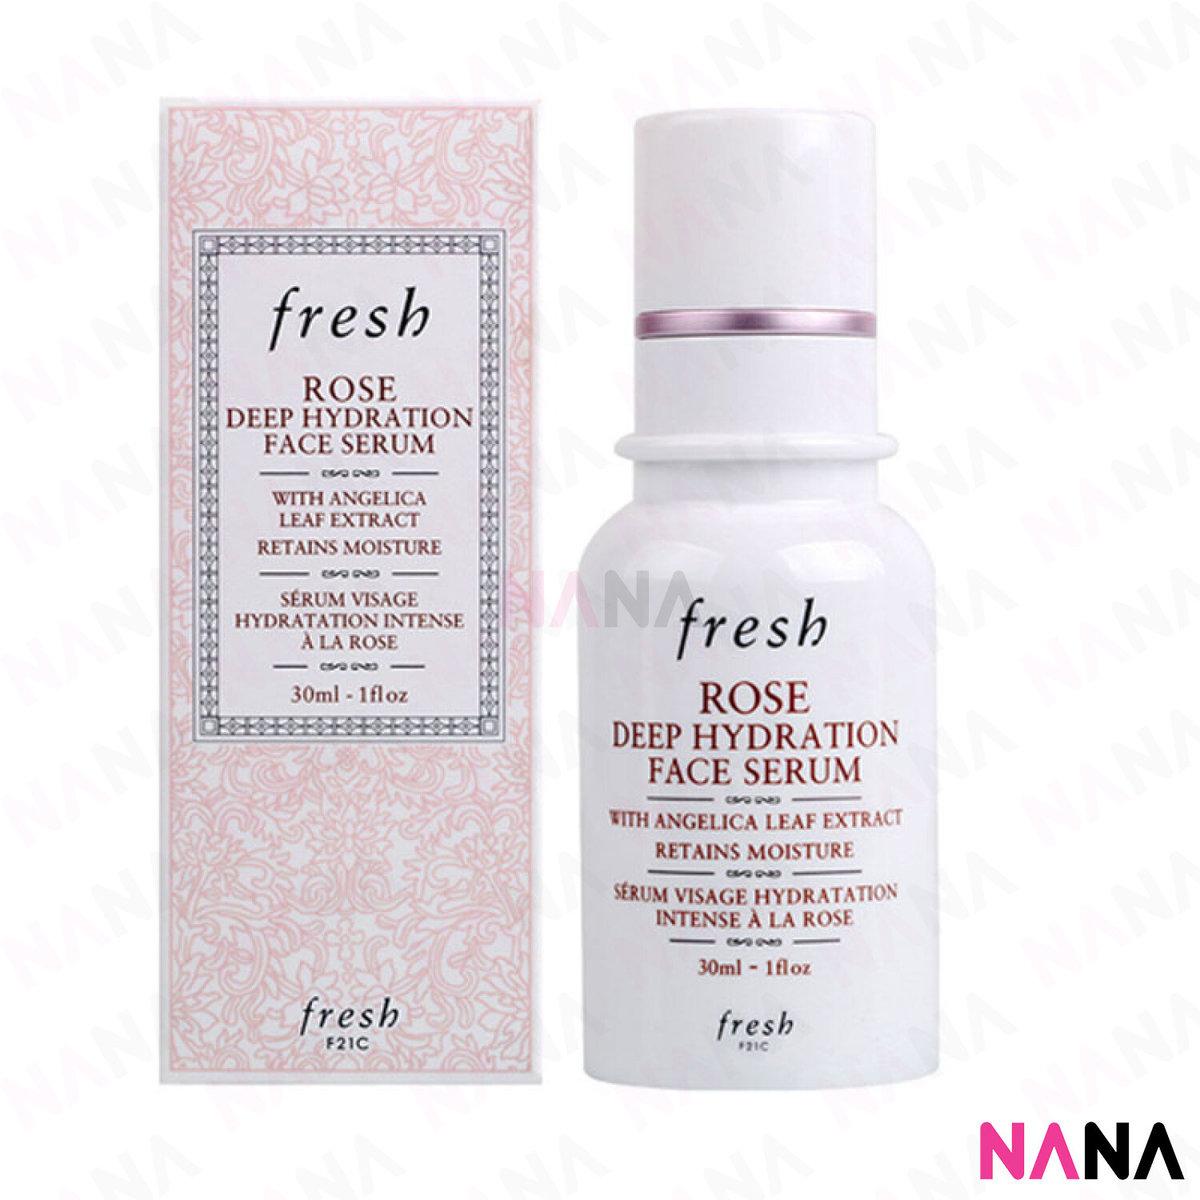 Rose Deep Hydration Face Serum 30ml